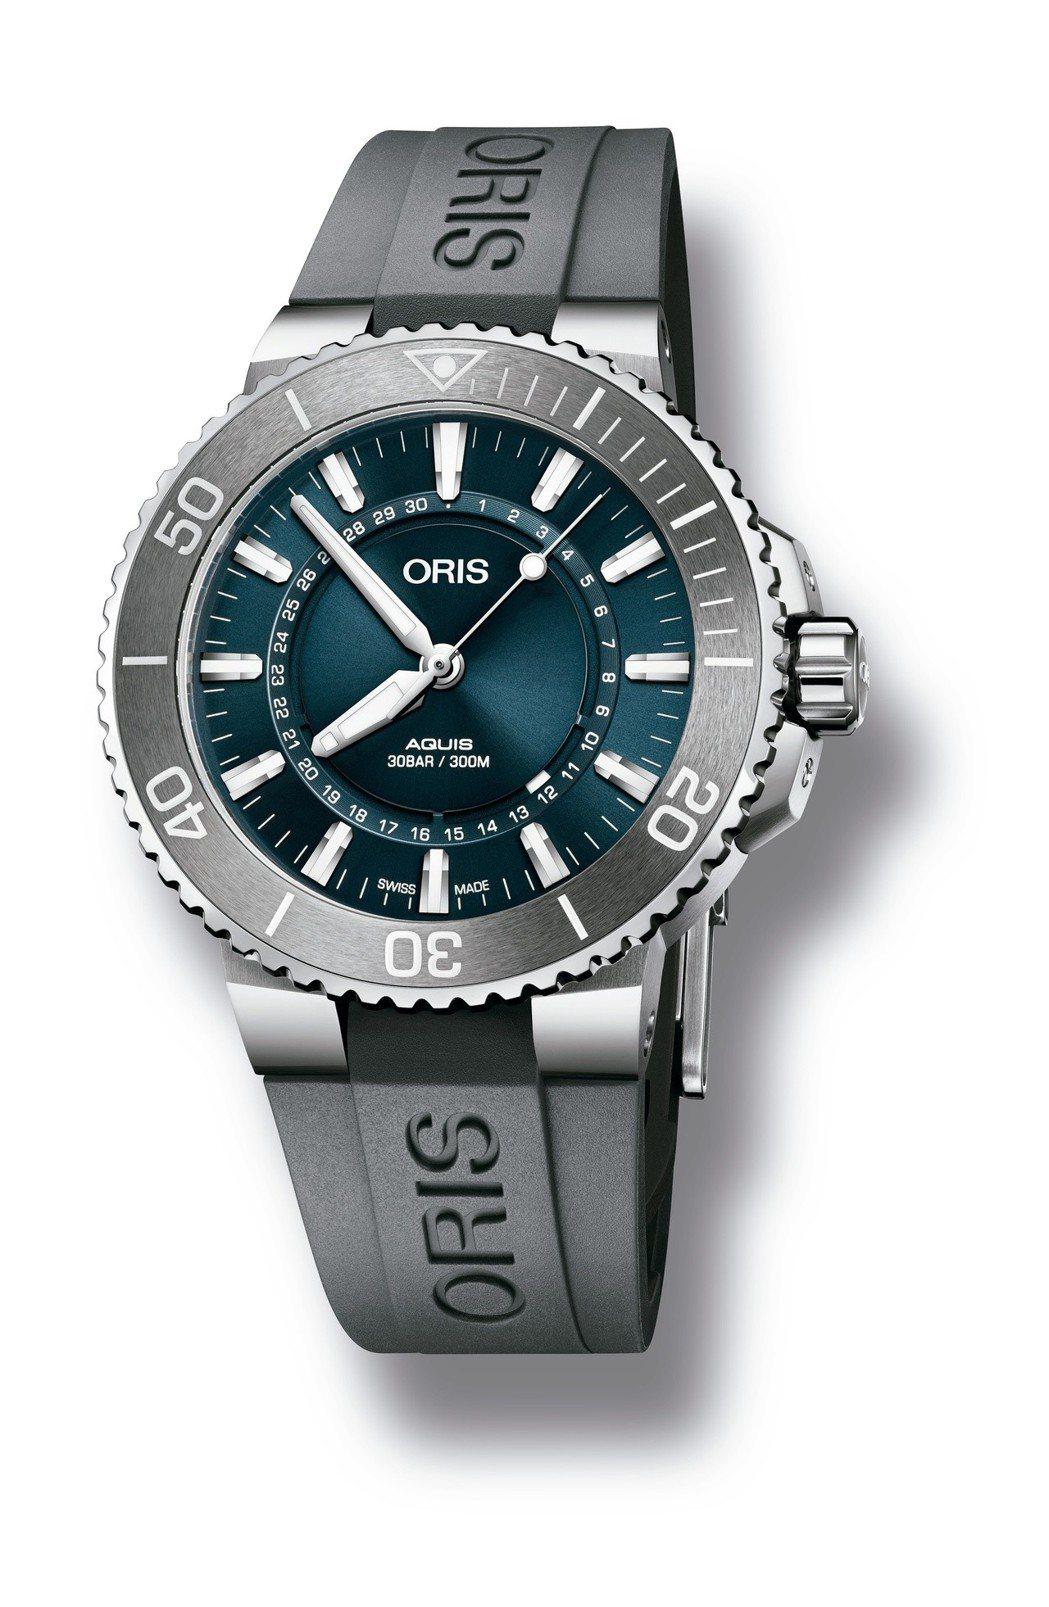 Oris生命之源腕表,具有環形日期顯示,表盤、橡膠表帶配色皆為首次使用,限量2,...